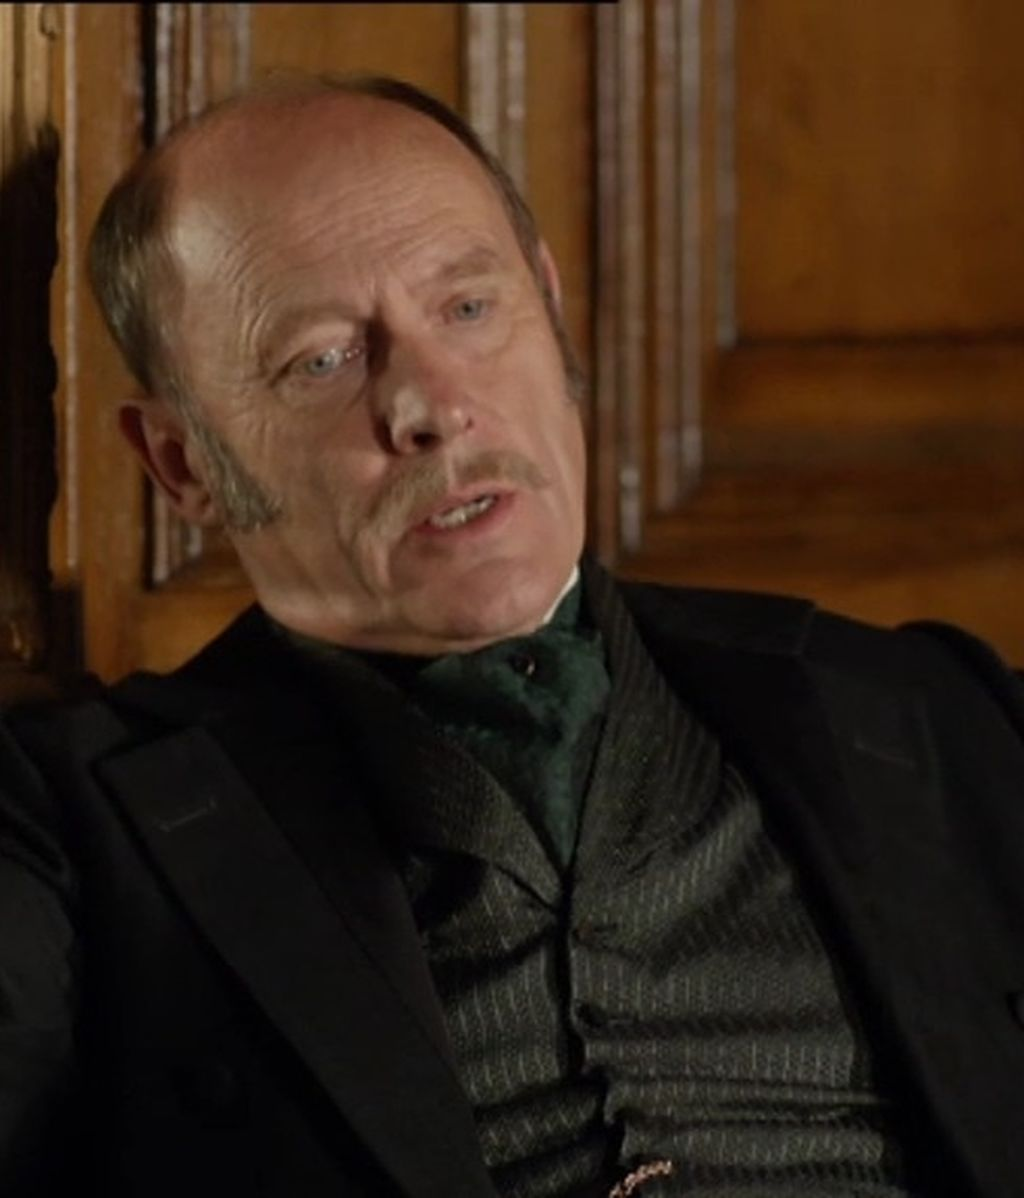 Lord Glendenning